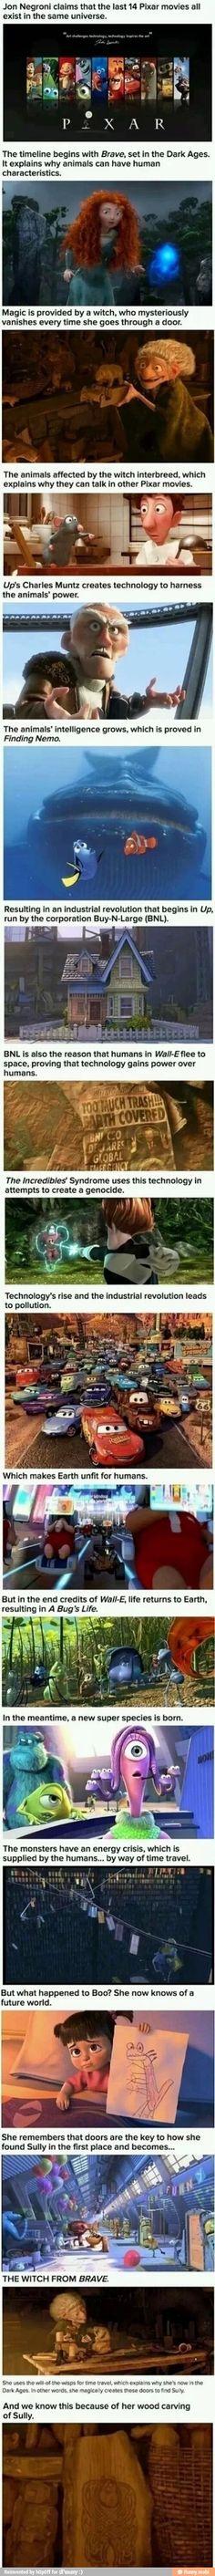 Pixar films connected